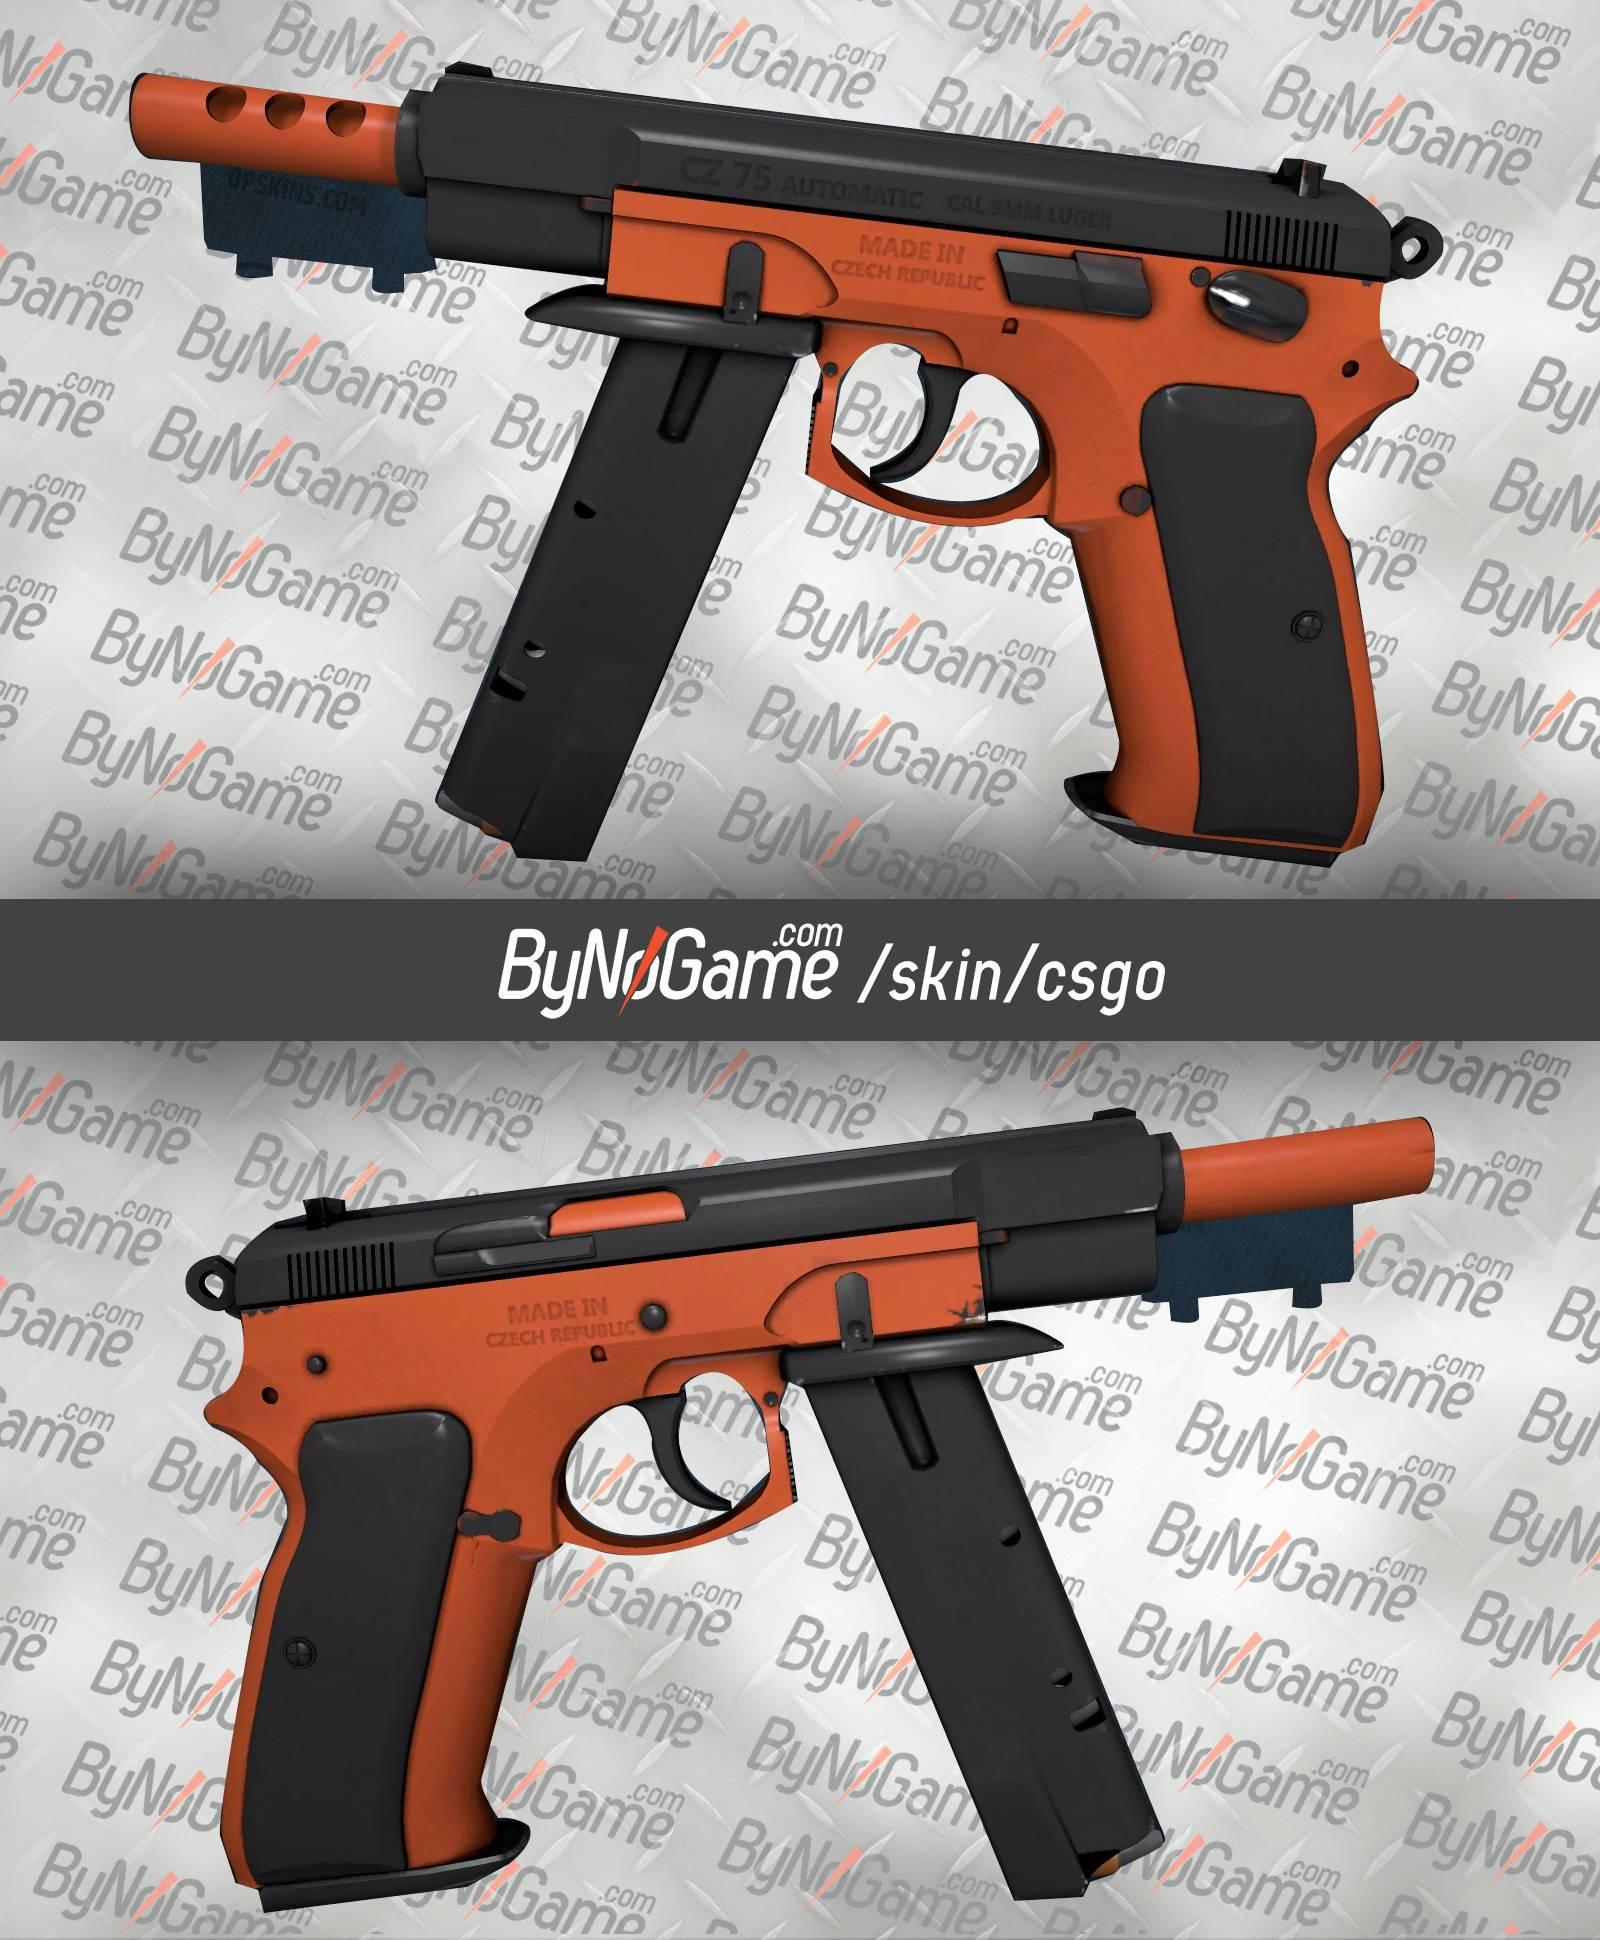 CZ75-Auto   Nitro (Factory New) - Pistols - CSGO Skin - ByNoGame